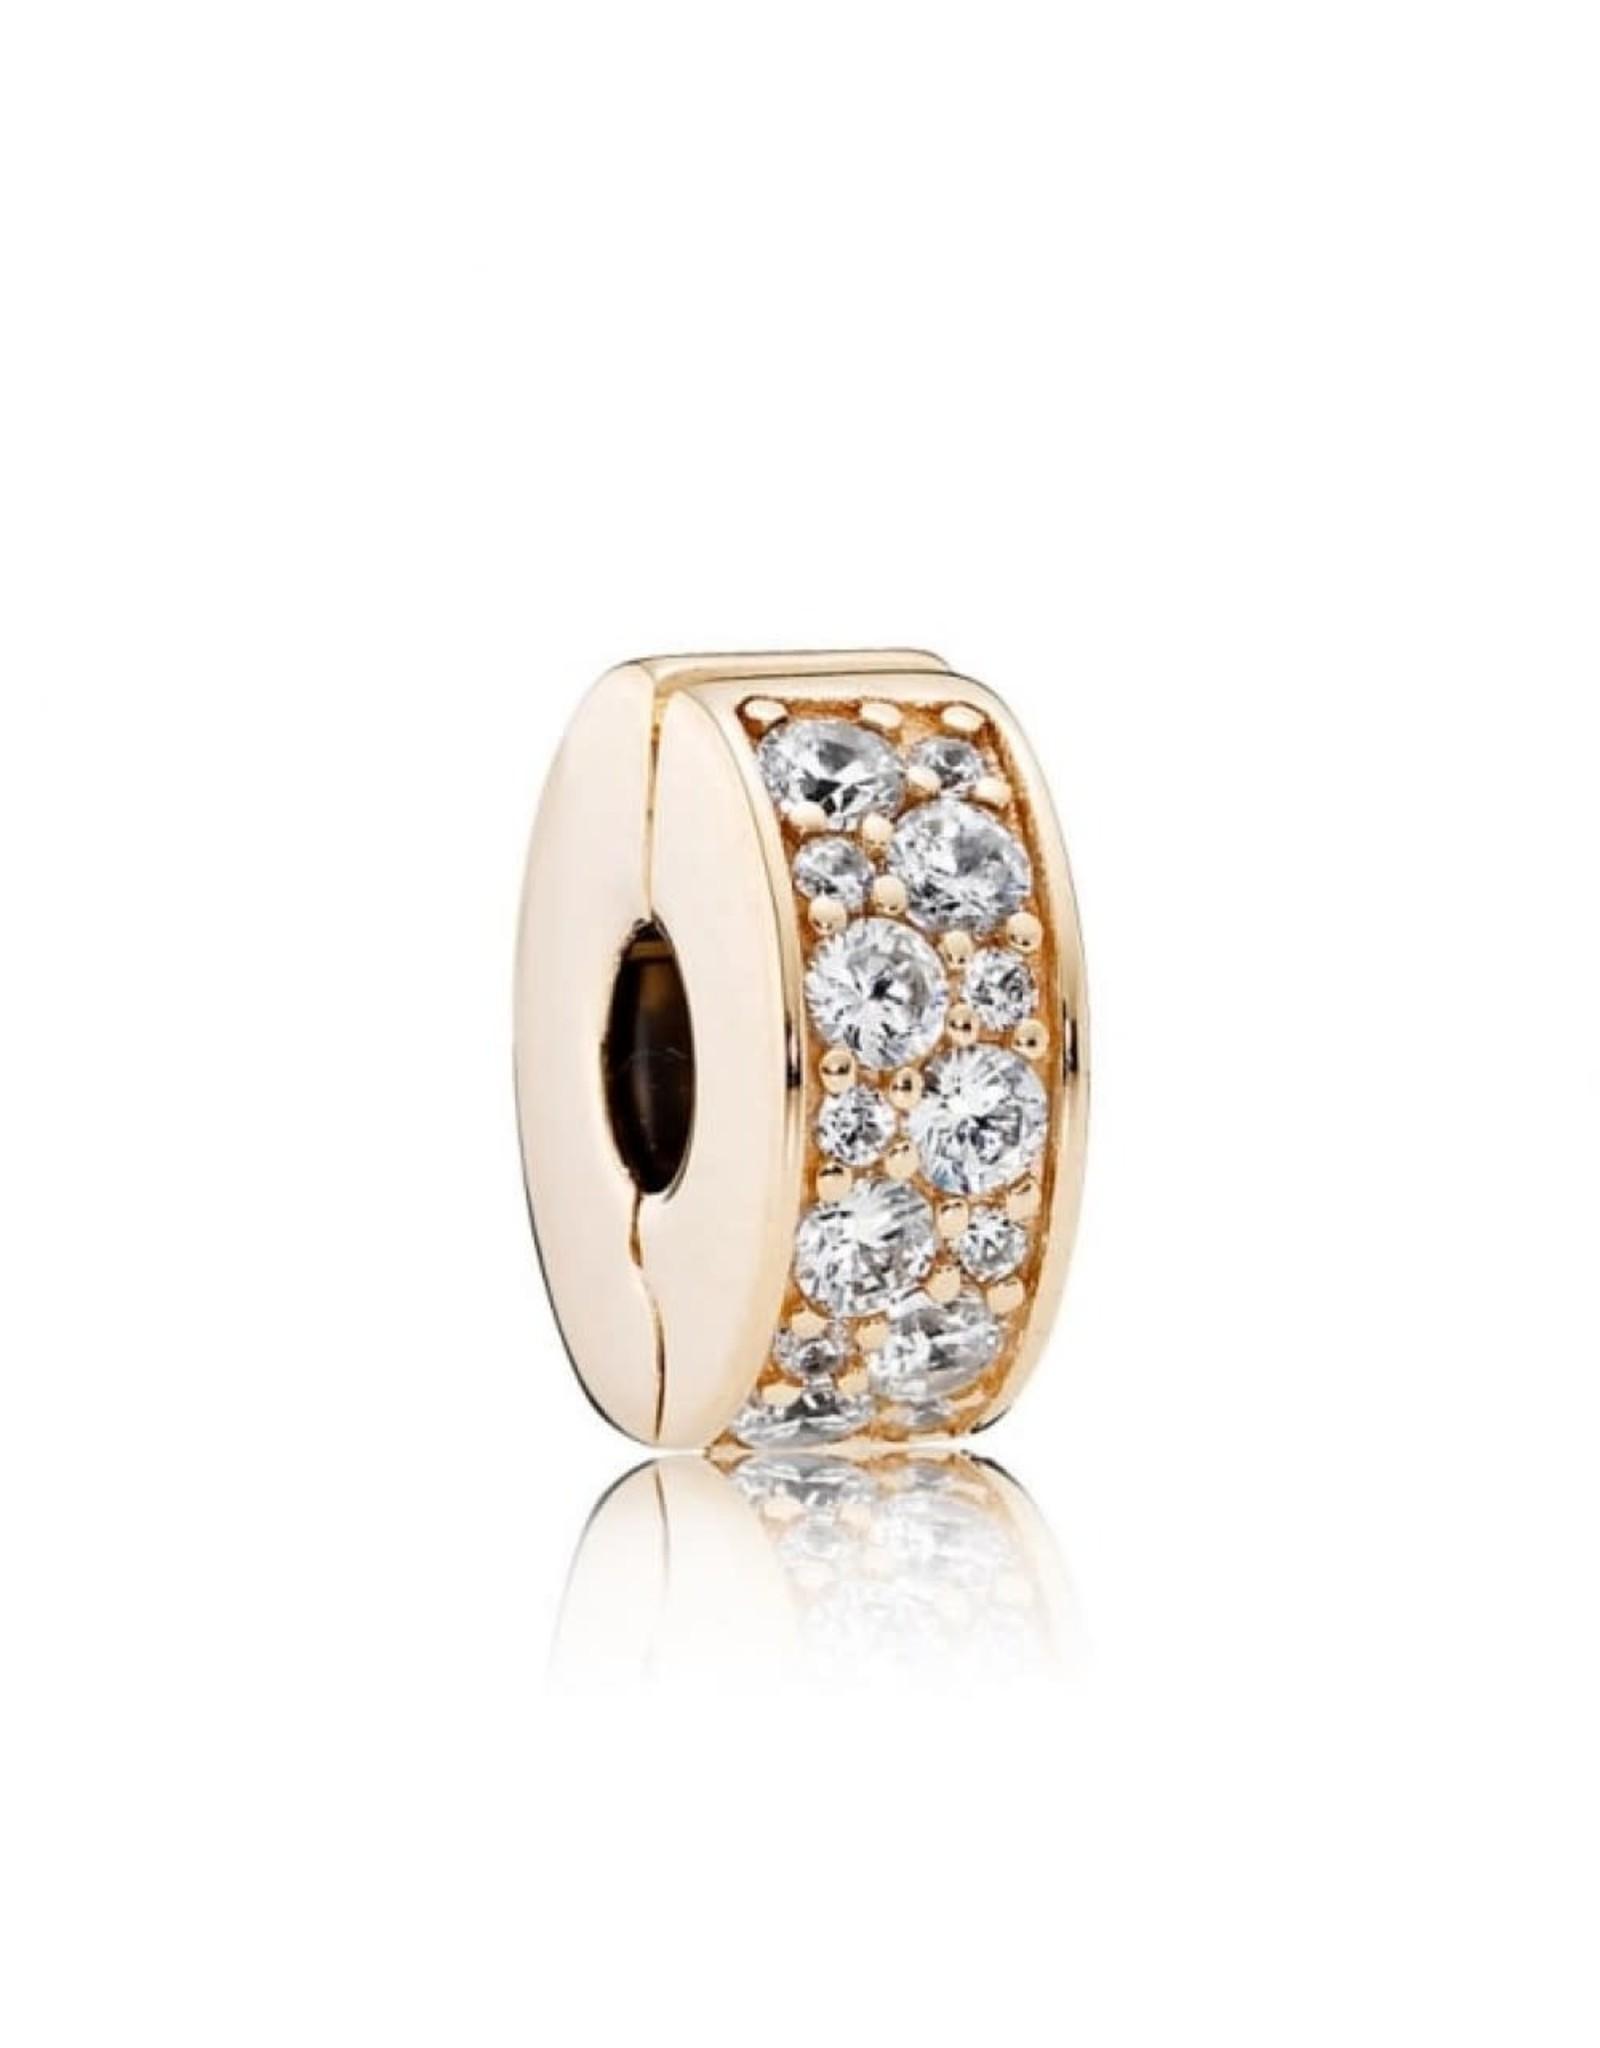 Pandora Pandora Clip Shining Elegance, 14K Gold with Clear, Silicone Grip